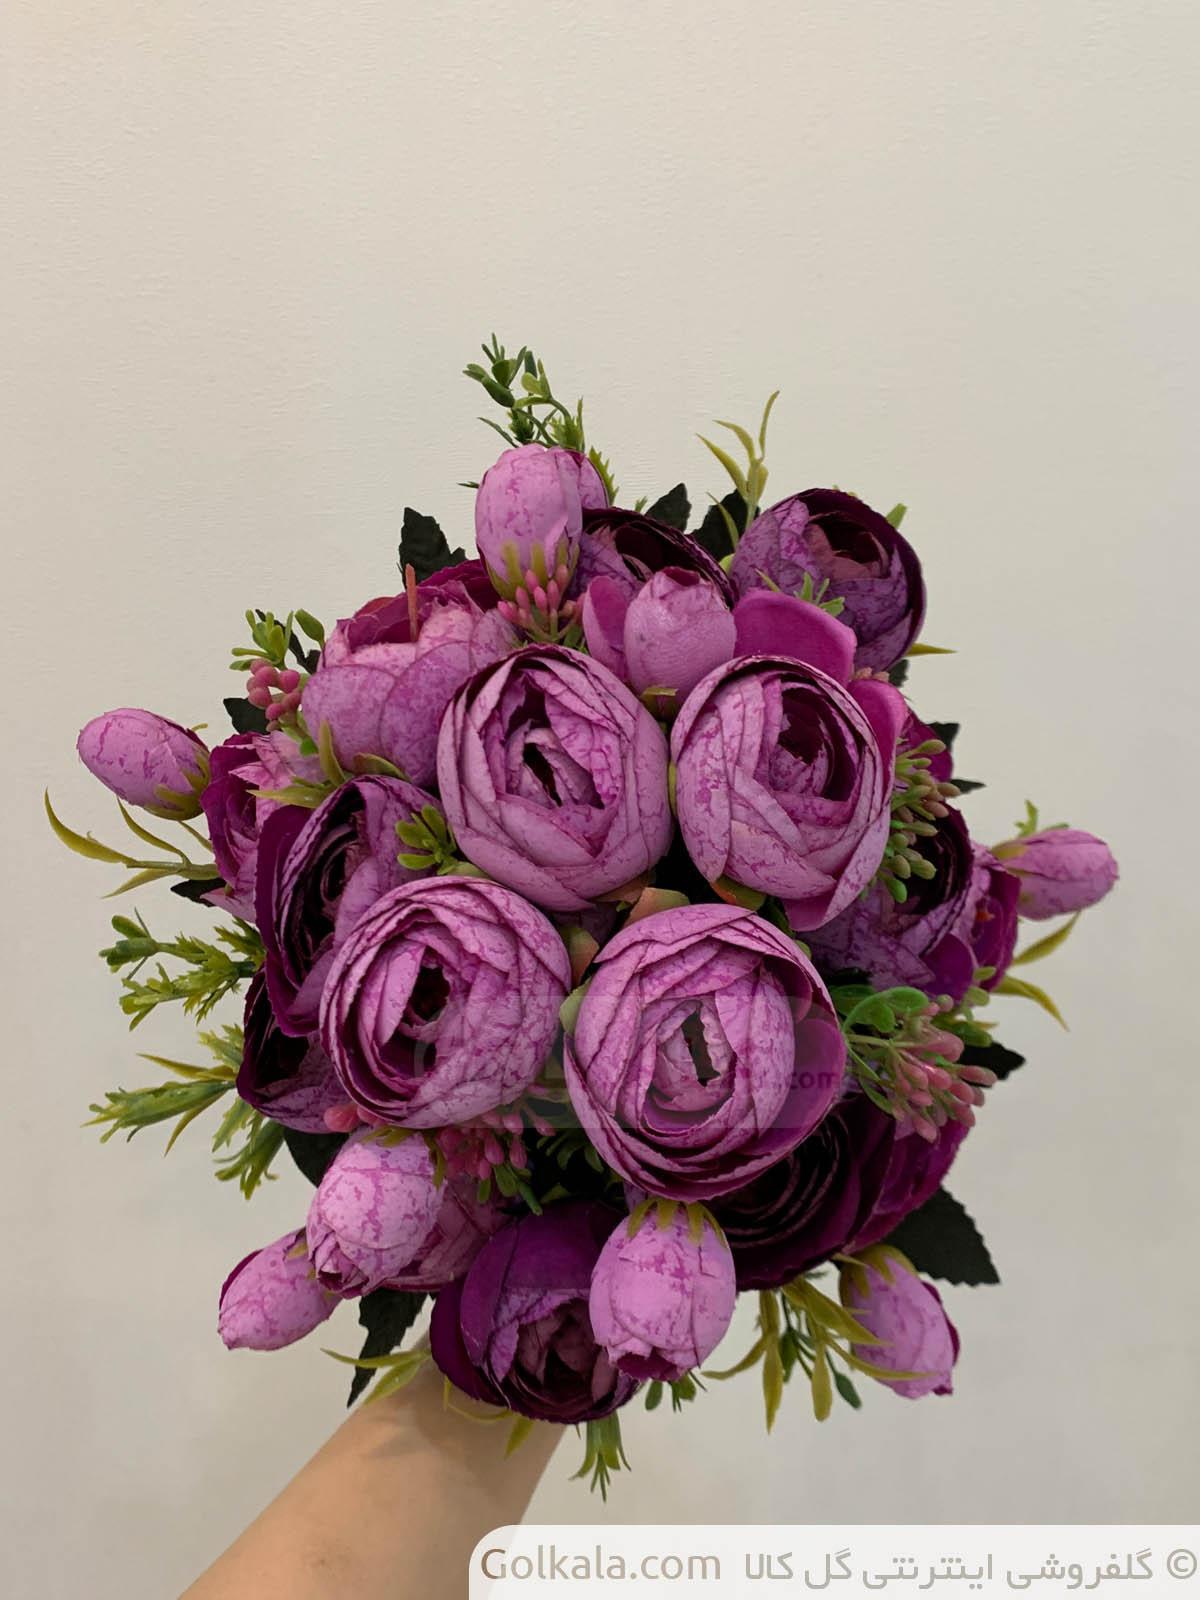 پیونی بنفش دسته دو گل گل کالا